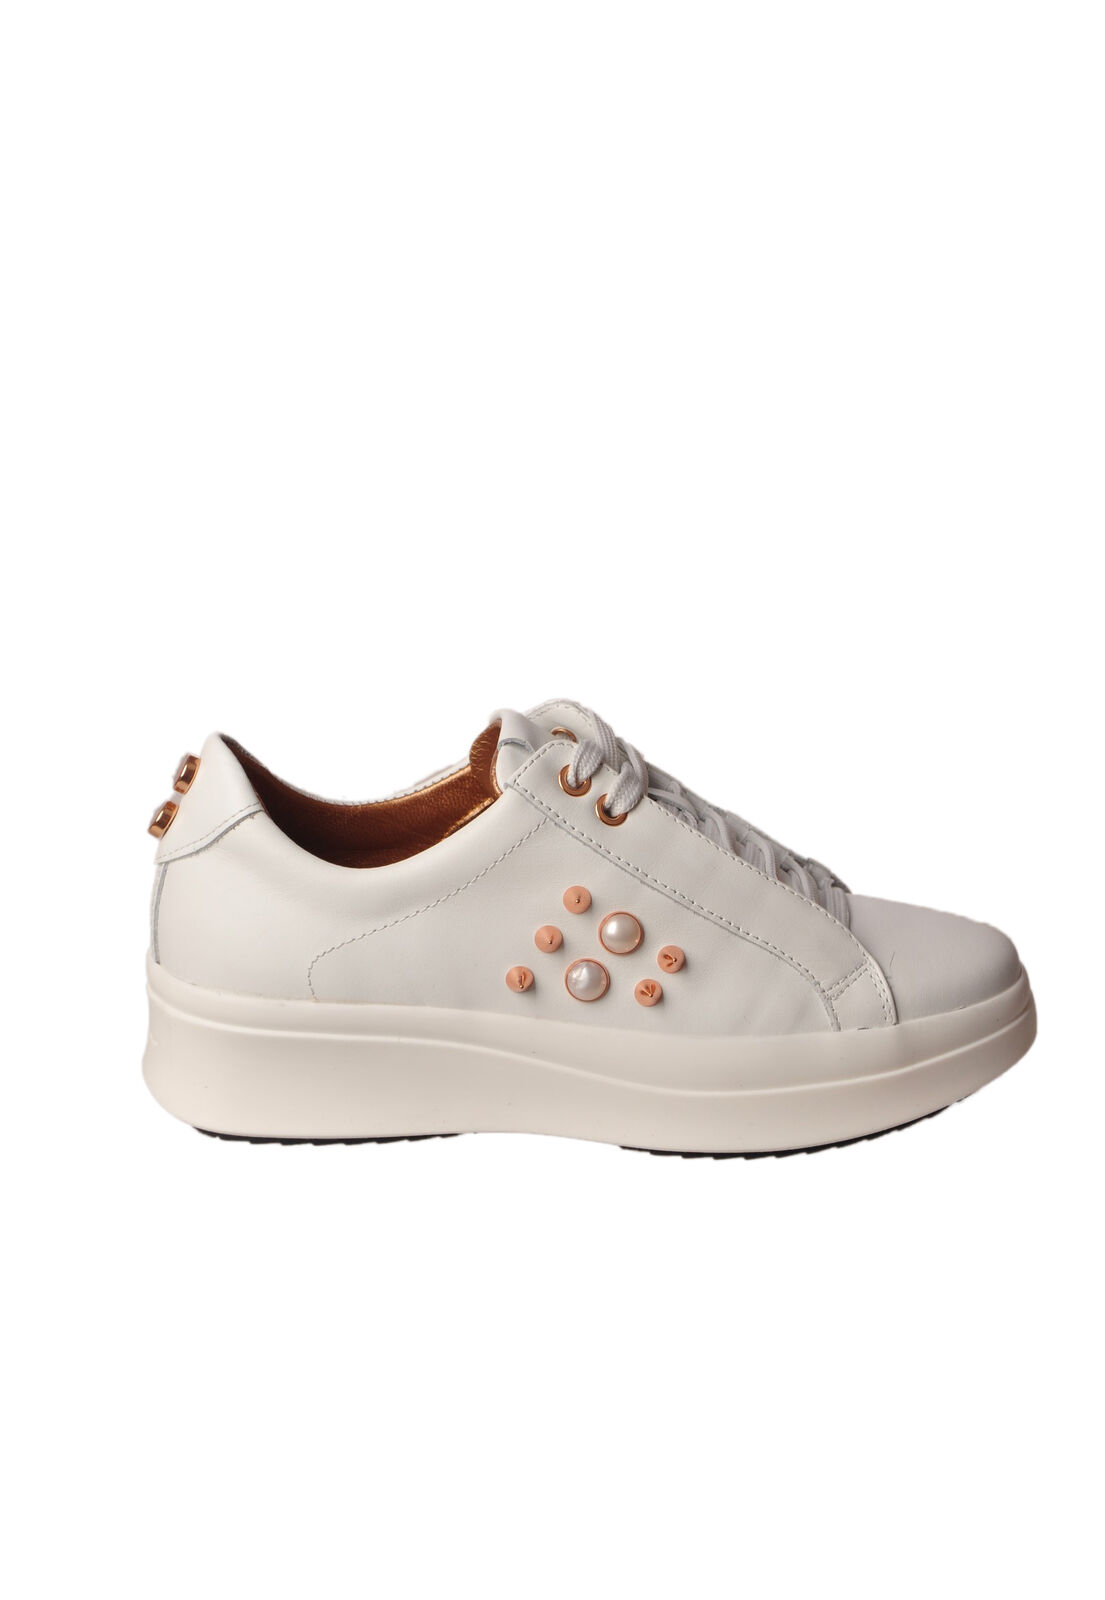 Alexander Smith - shoes-Sneakers low - Woman - White - 5030608E184312